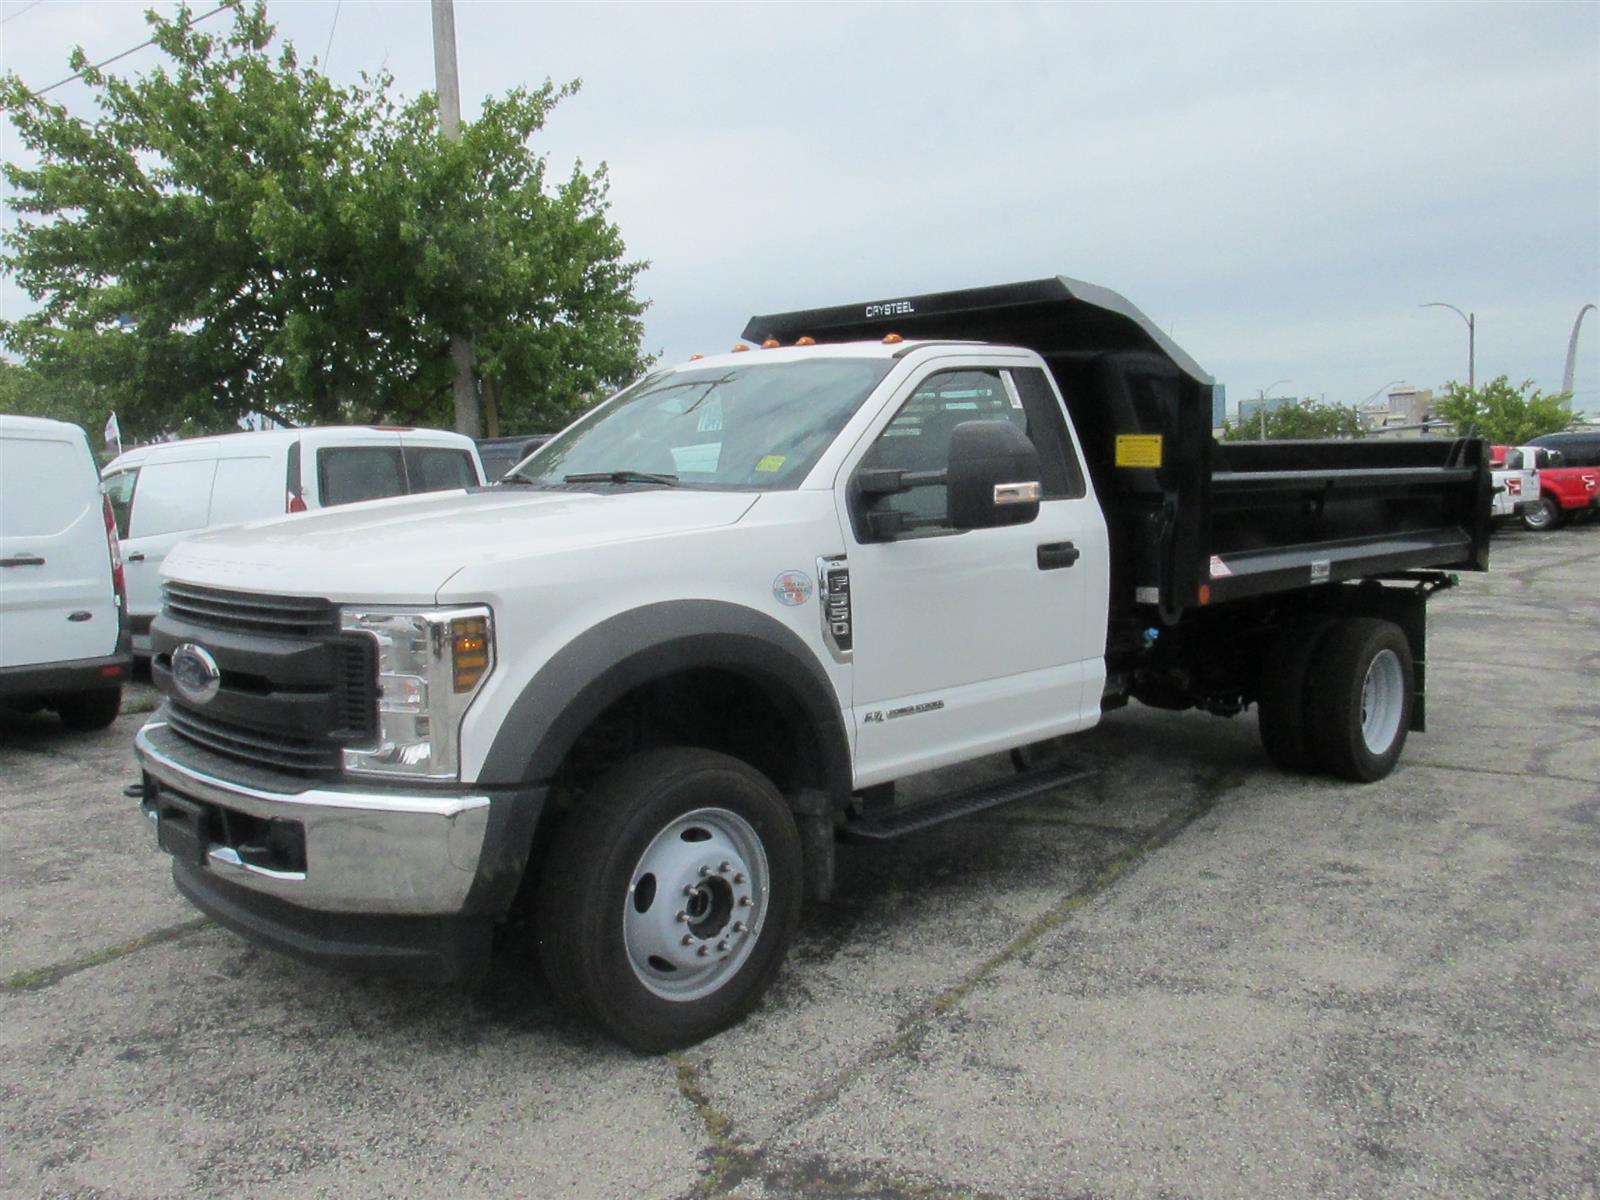 2019 Ford F-550 Regular Cab DRW 4x4, Crysteel Dump Body #4096 - photo 1